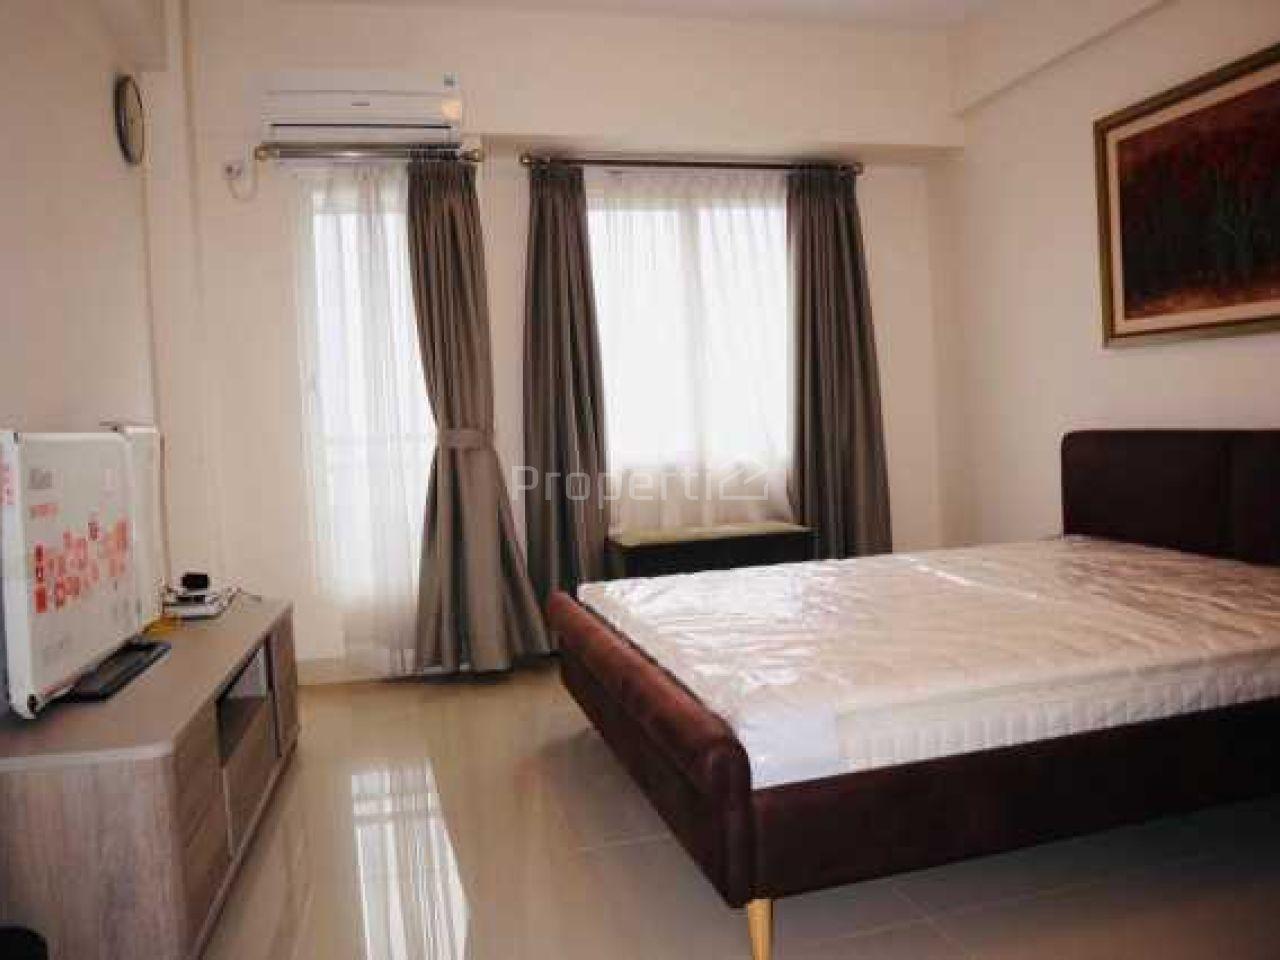 New 1BR Apartment Unit at Galeri Ciumbuleuit 2, 29th Floor, Jawa Barat